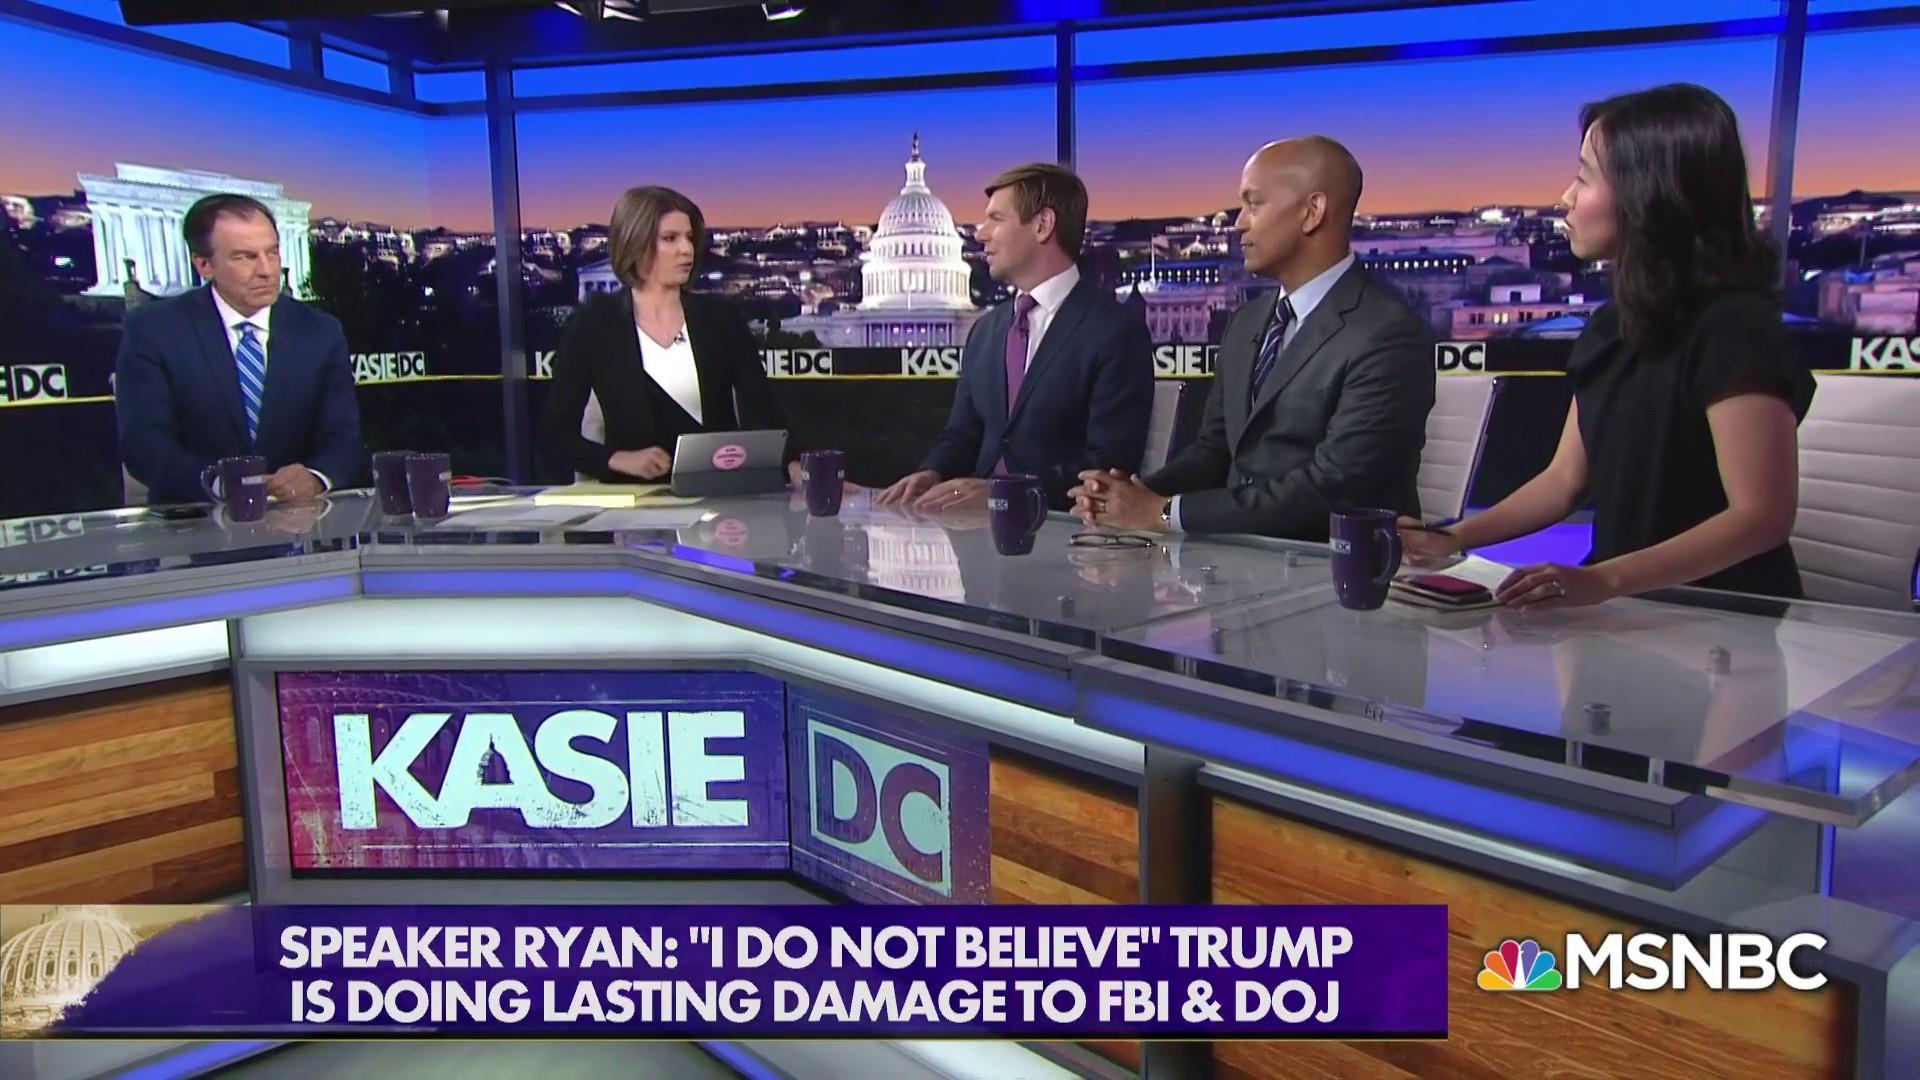 Speaker Ryan: 'I do not believe' Trump is doing lasting damage to DOJ, FBI